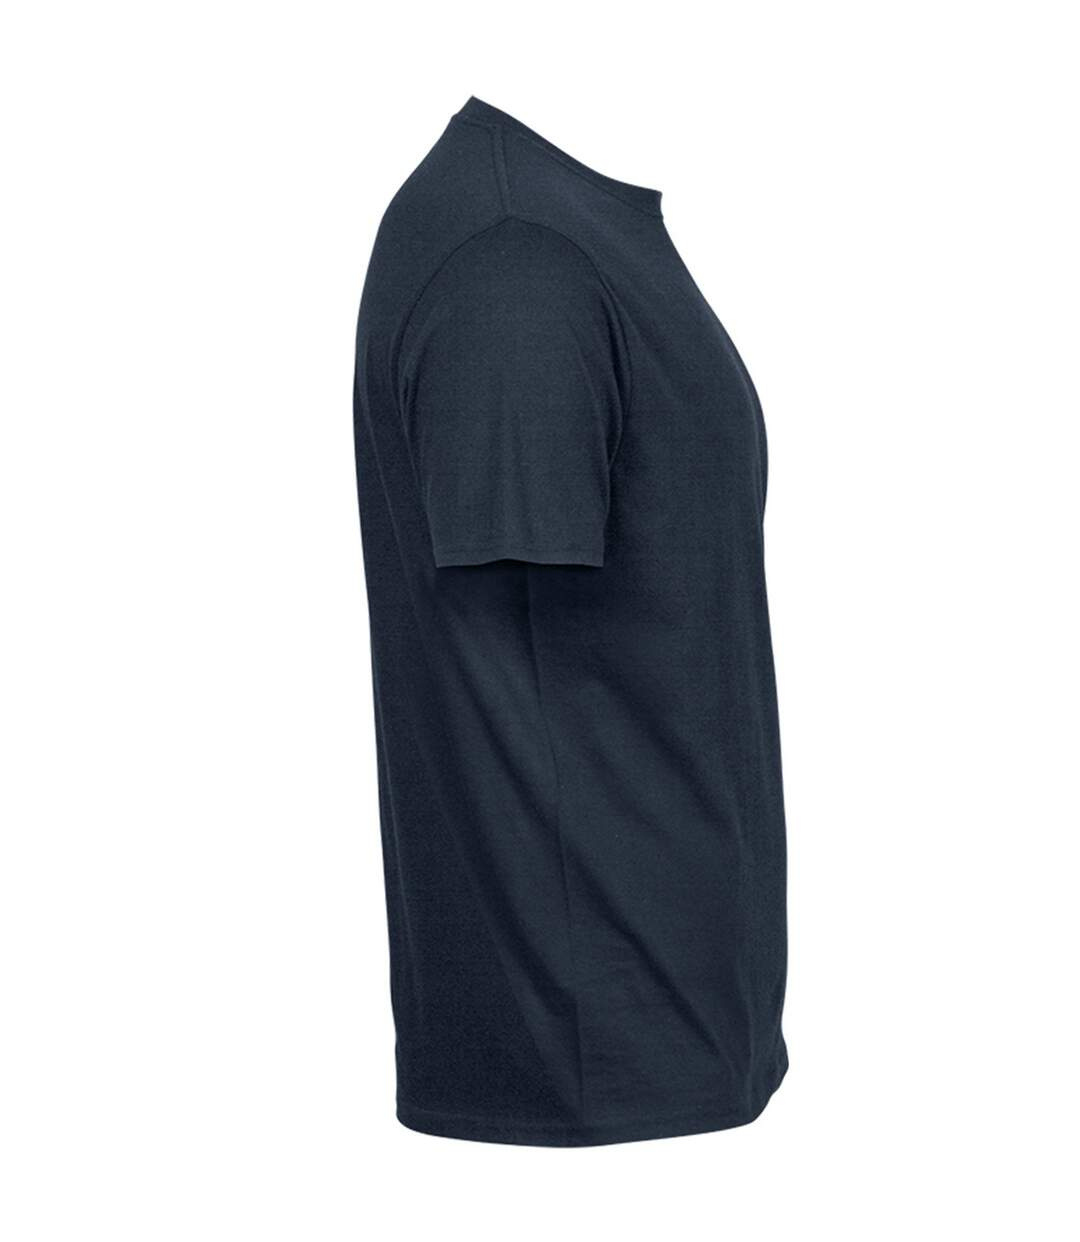 Tee Jays Mens Power T-Shirt (Navy) - UTPC4092